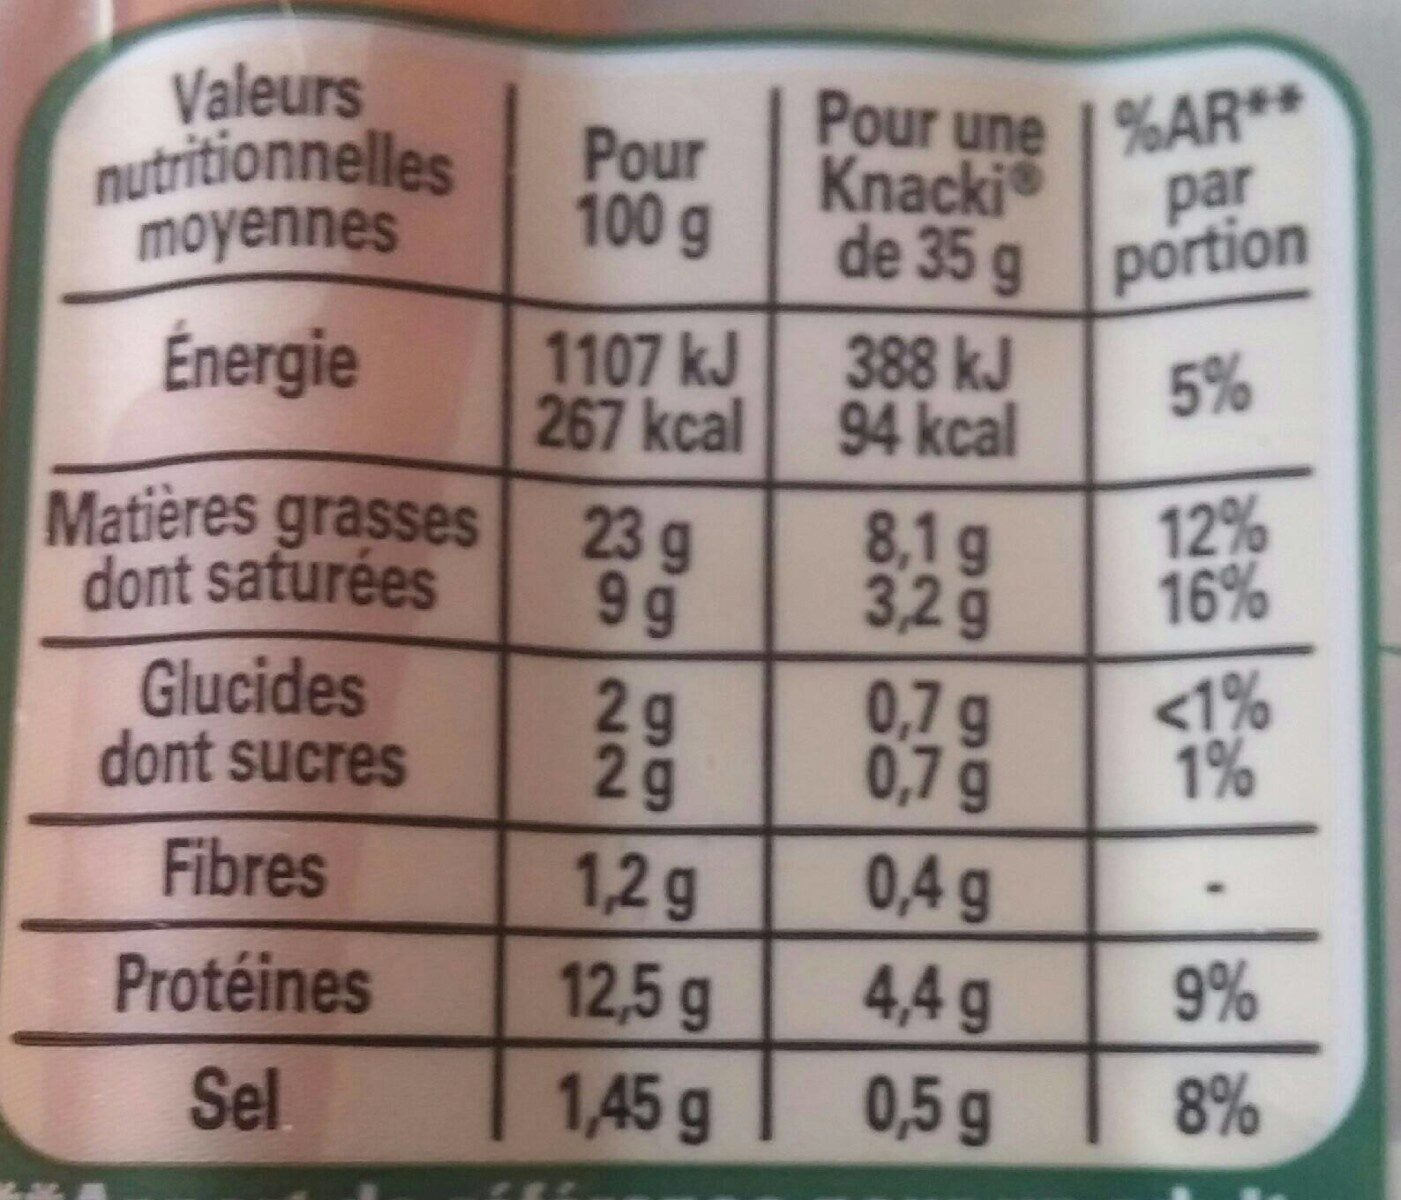 KNACKI Original saucisses pur porc -25% sel - Voedingswaarden - fr